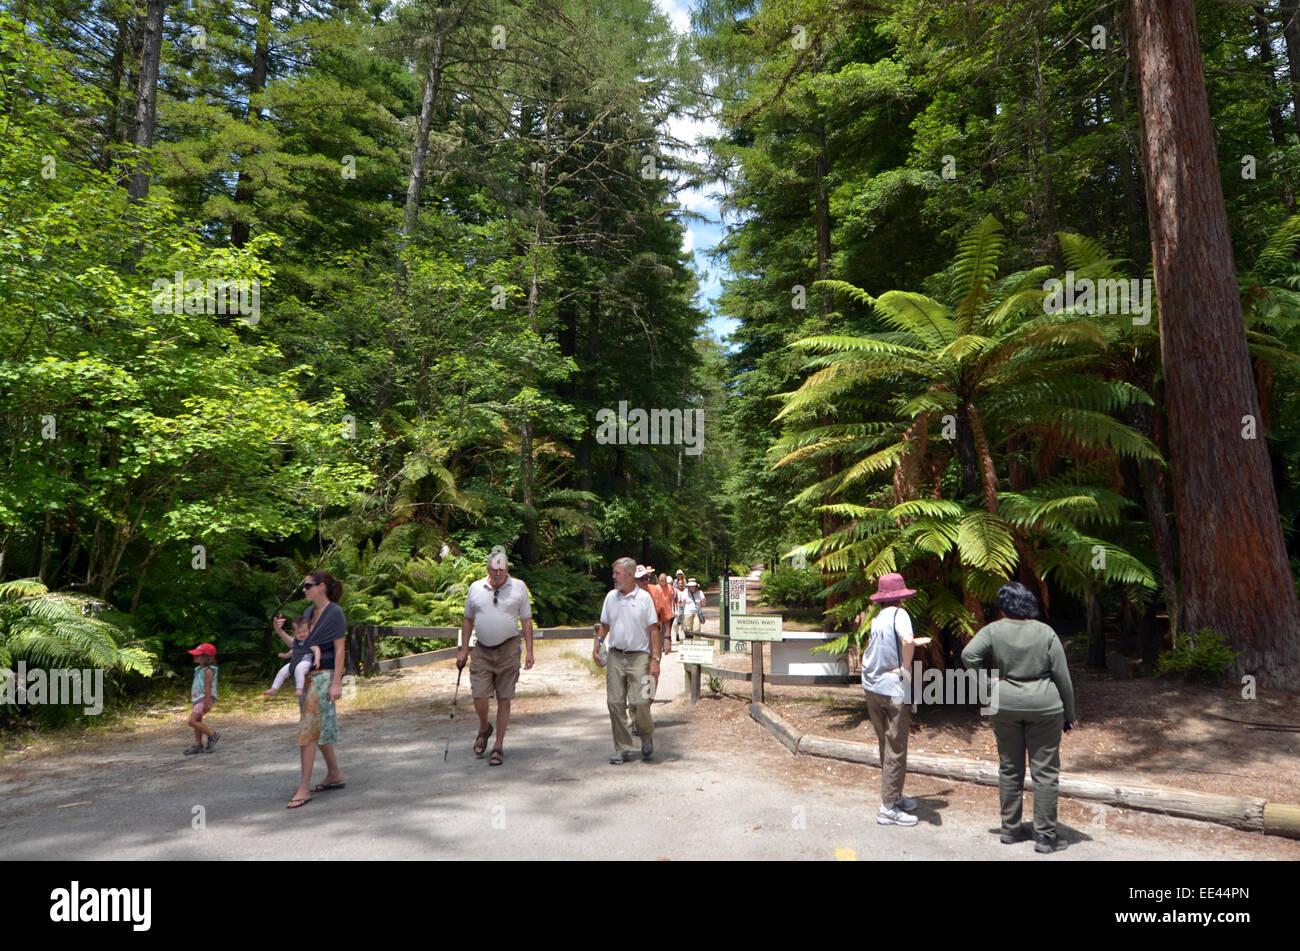 ROTORUA, NZL - JAN 12 2015:Visitors in Redwoods – Whakarewarewa Forest in Rotorua, New Zealand.It's an exsotic - Stock Image